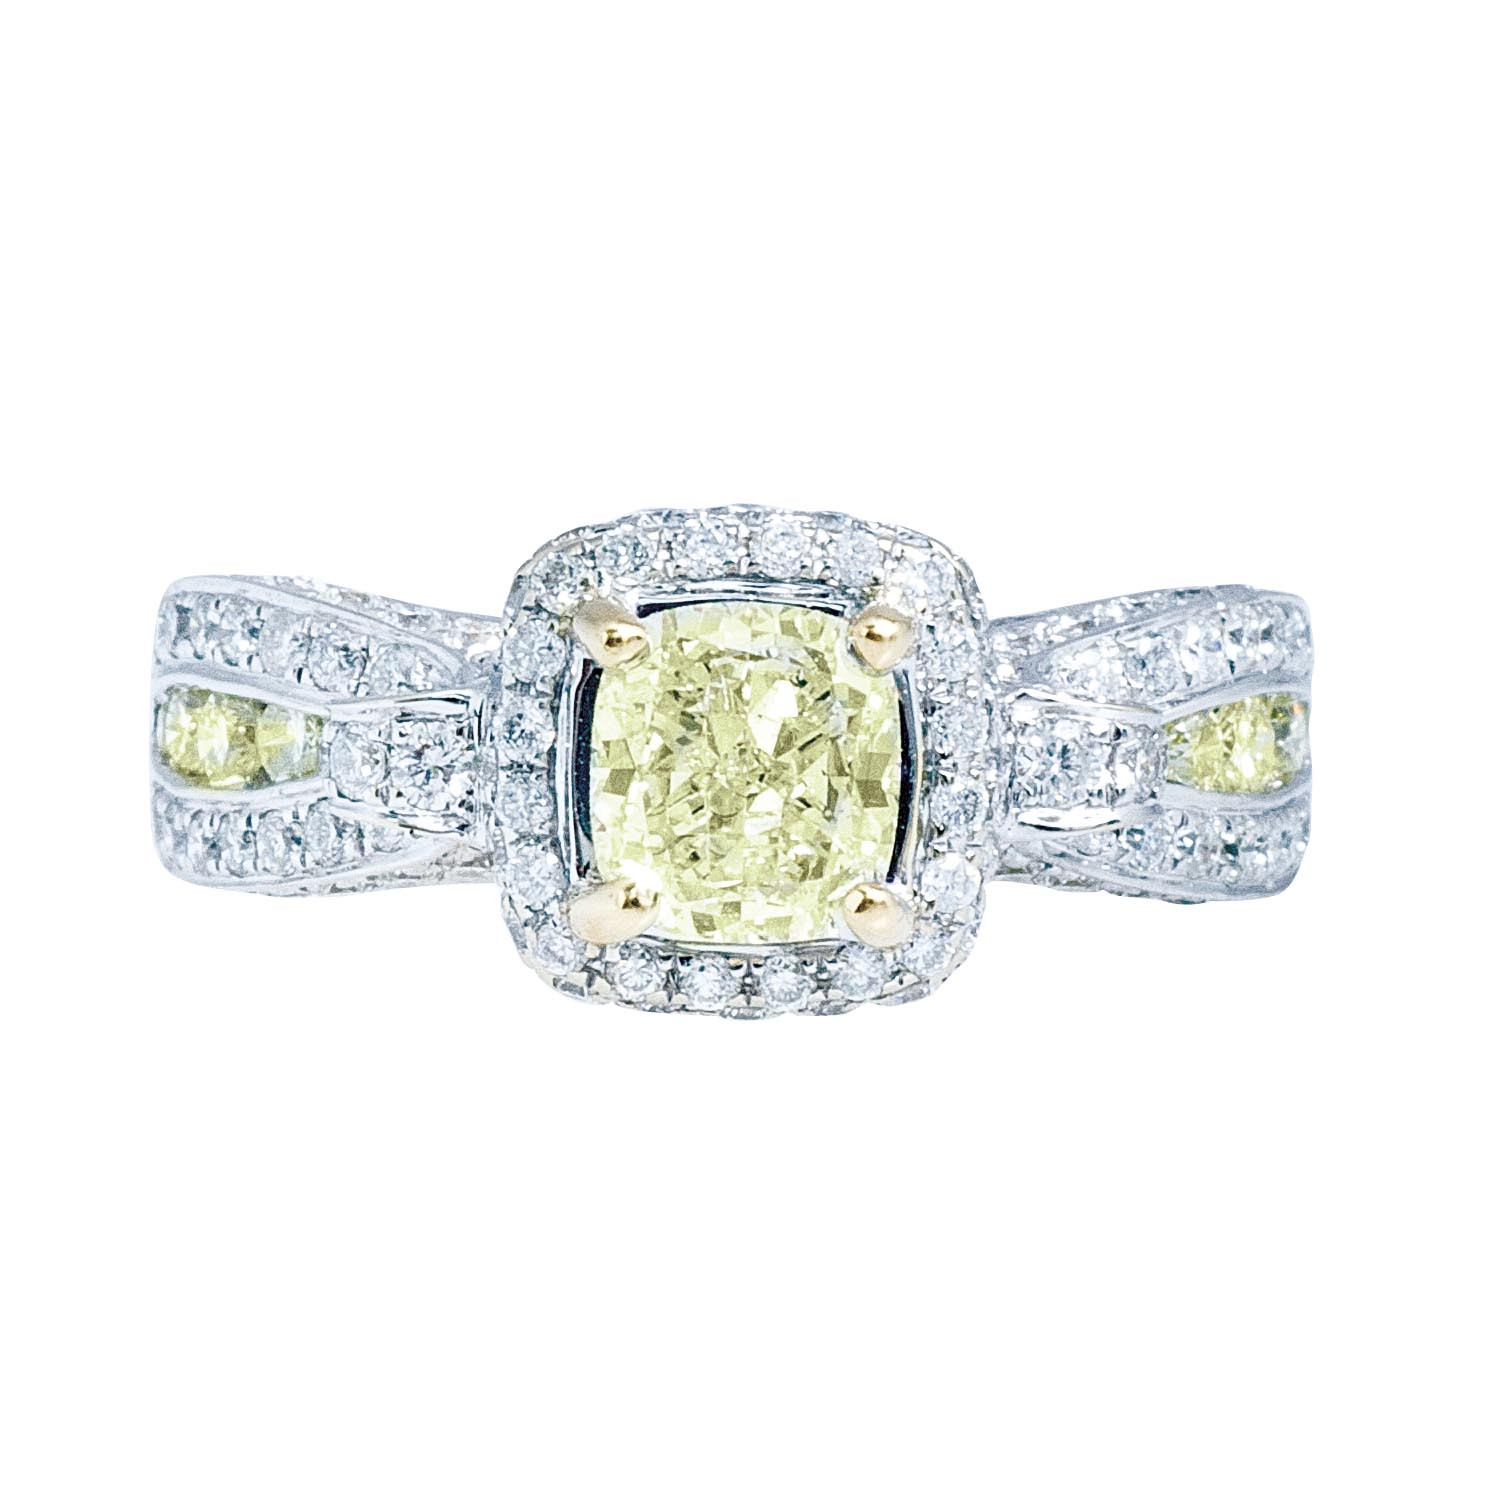 Vintage 1.96 CTW Fancy Yellow & White Diamond Halo Engagement Ring